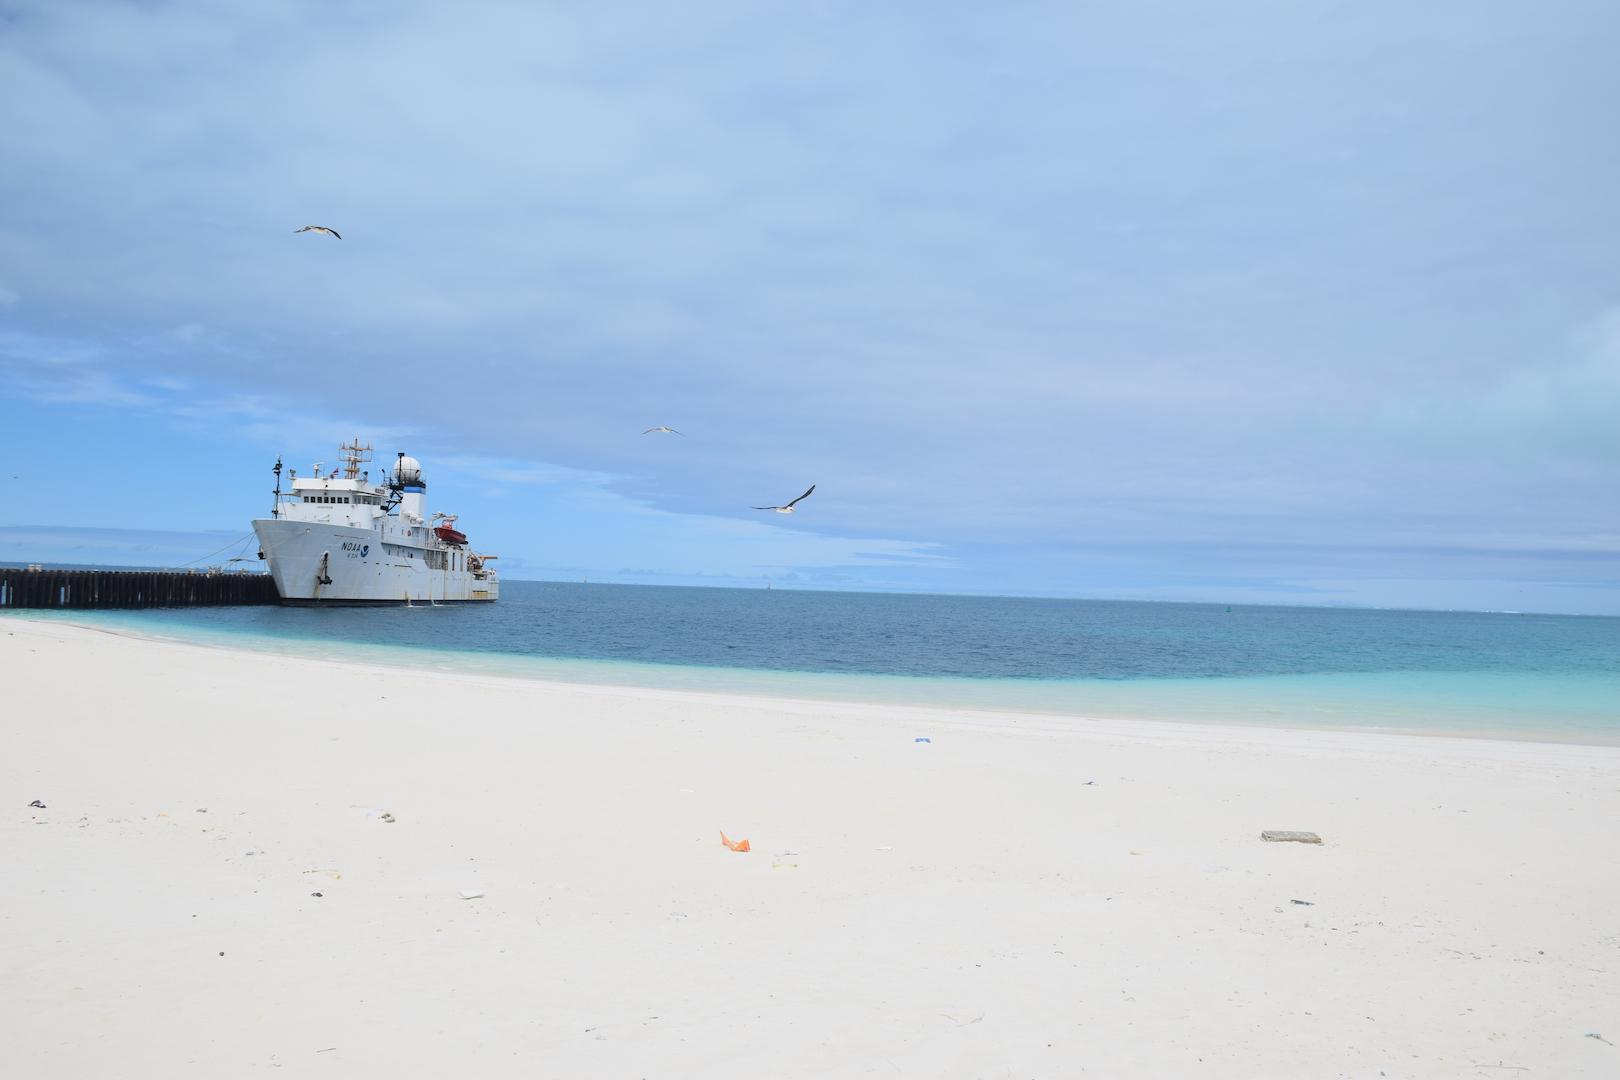 NOAA, Ship, Hi'ialakai, Midway, Atoll, Island, Maine, Debris, Cruise